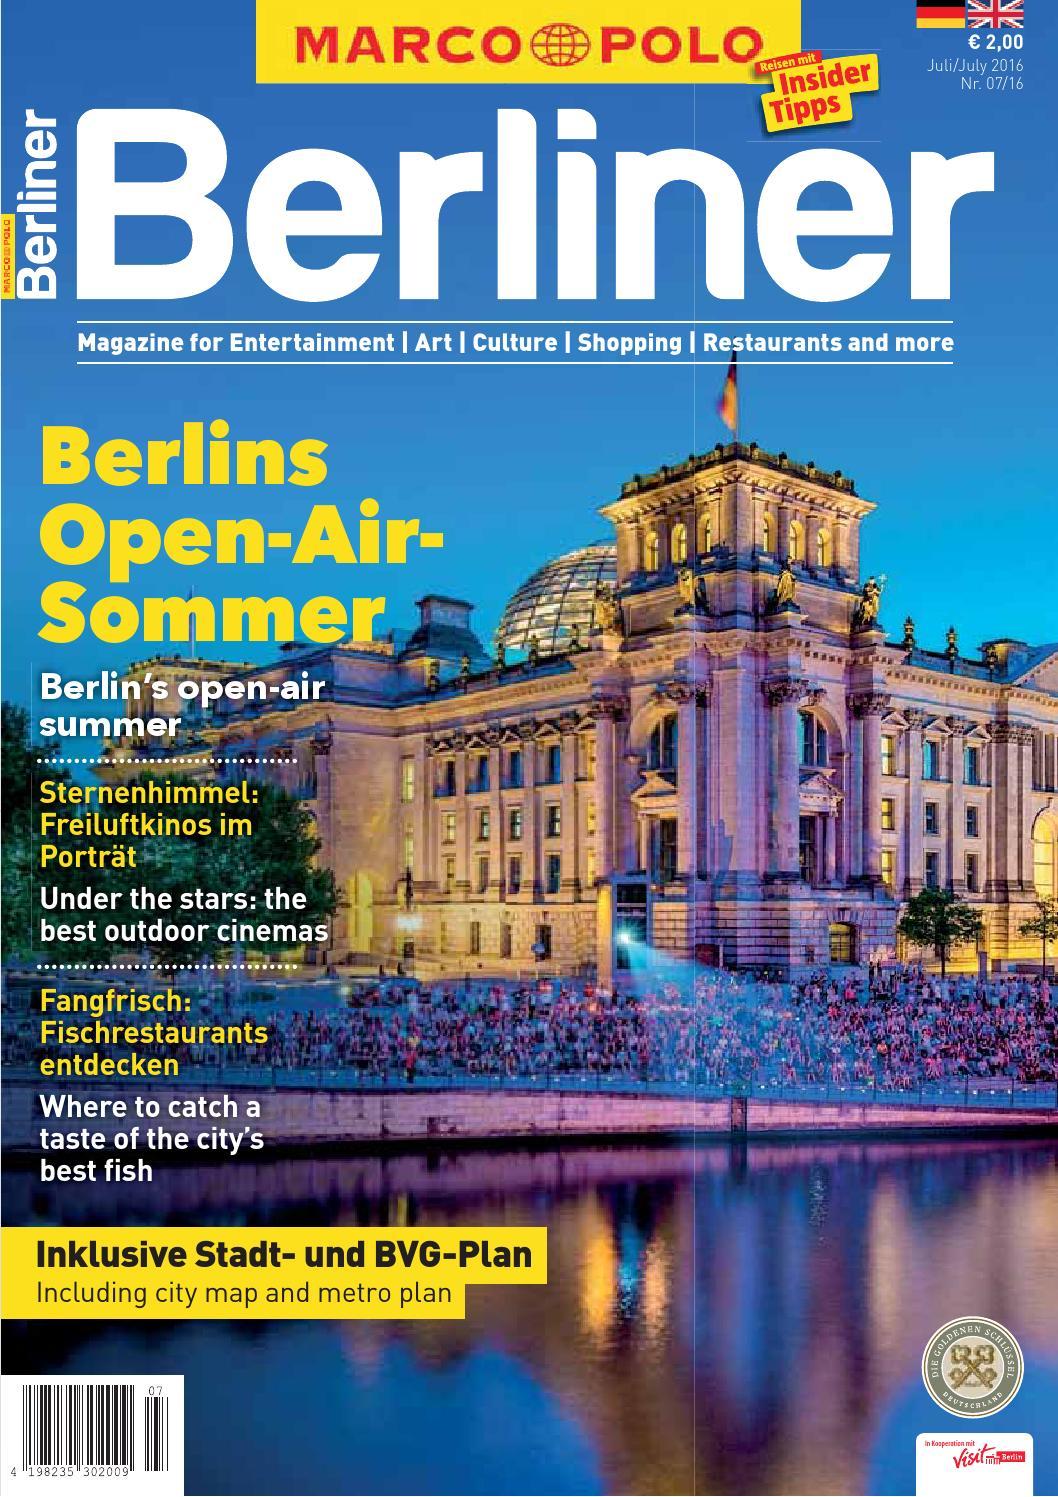 Marco Polo Berliner 07/16 by Berlin Medien GmbH - issuu